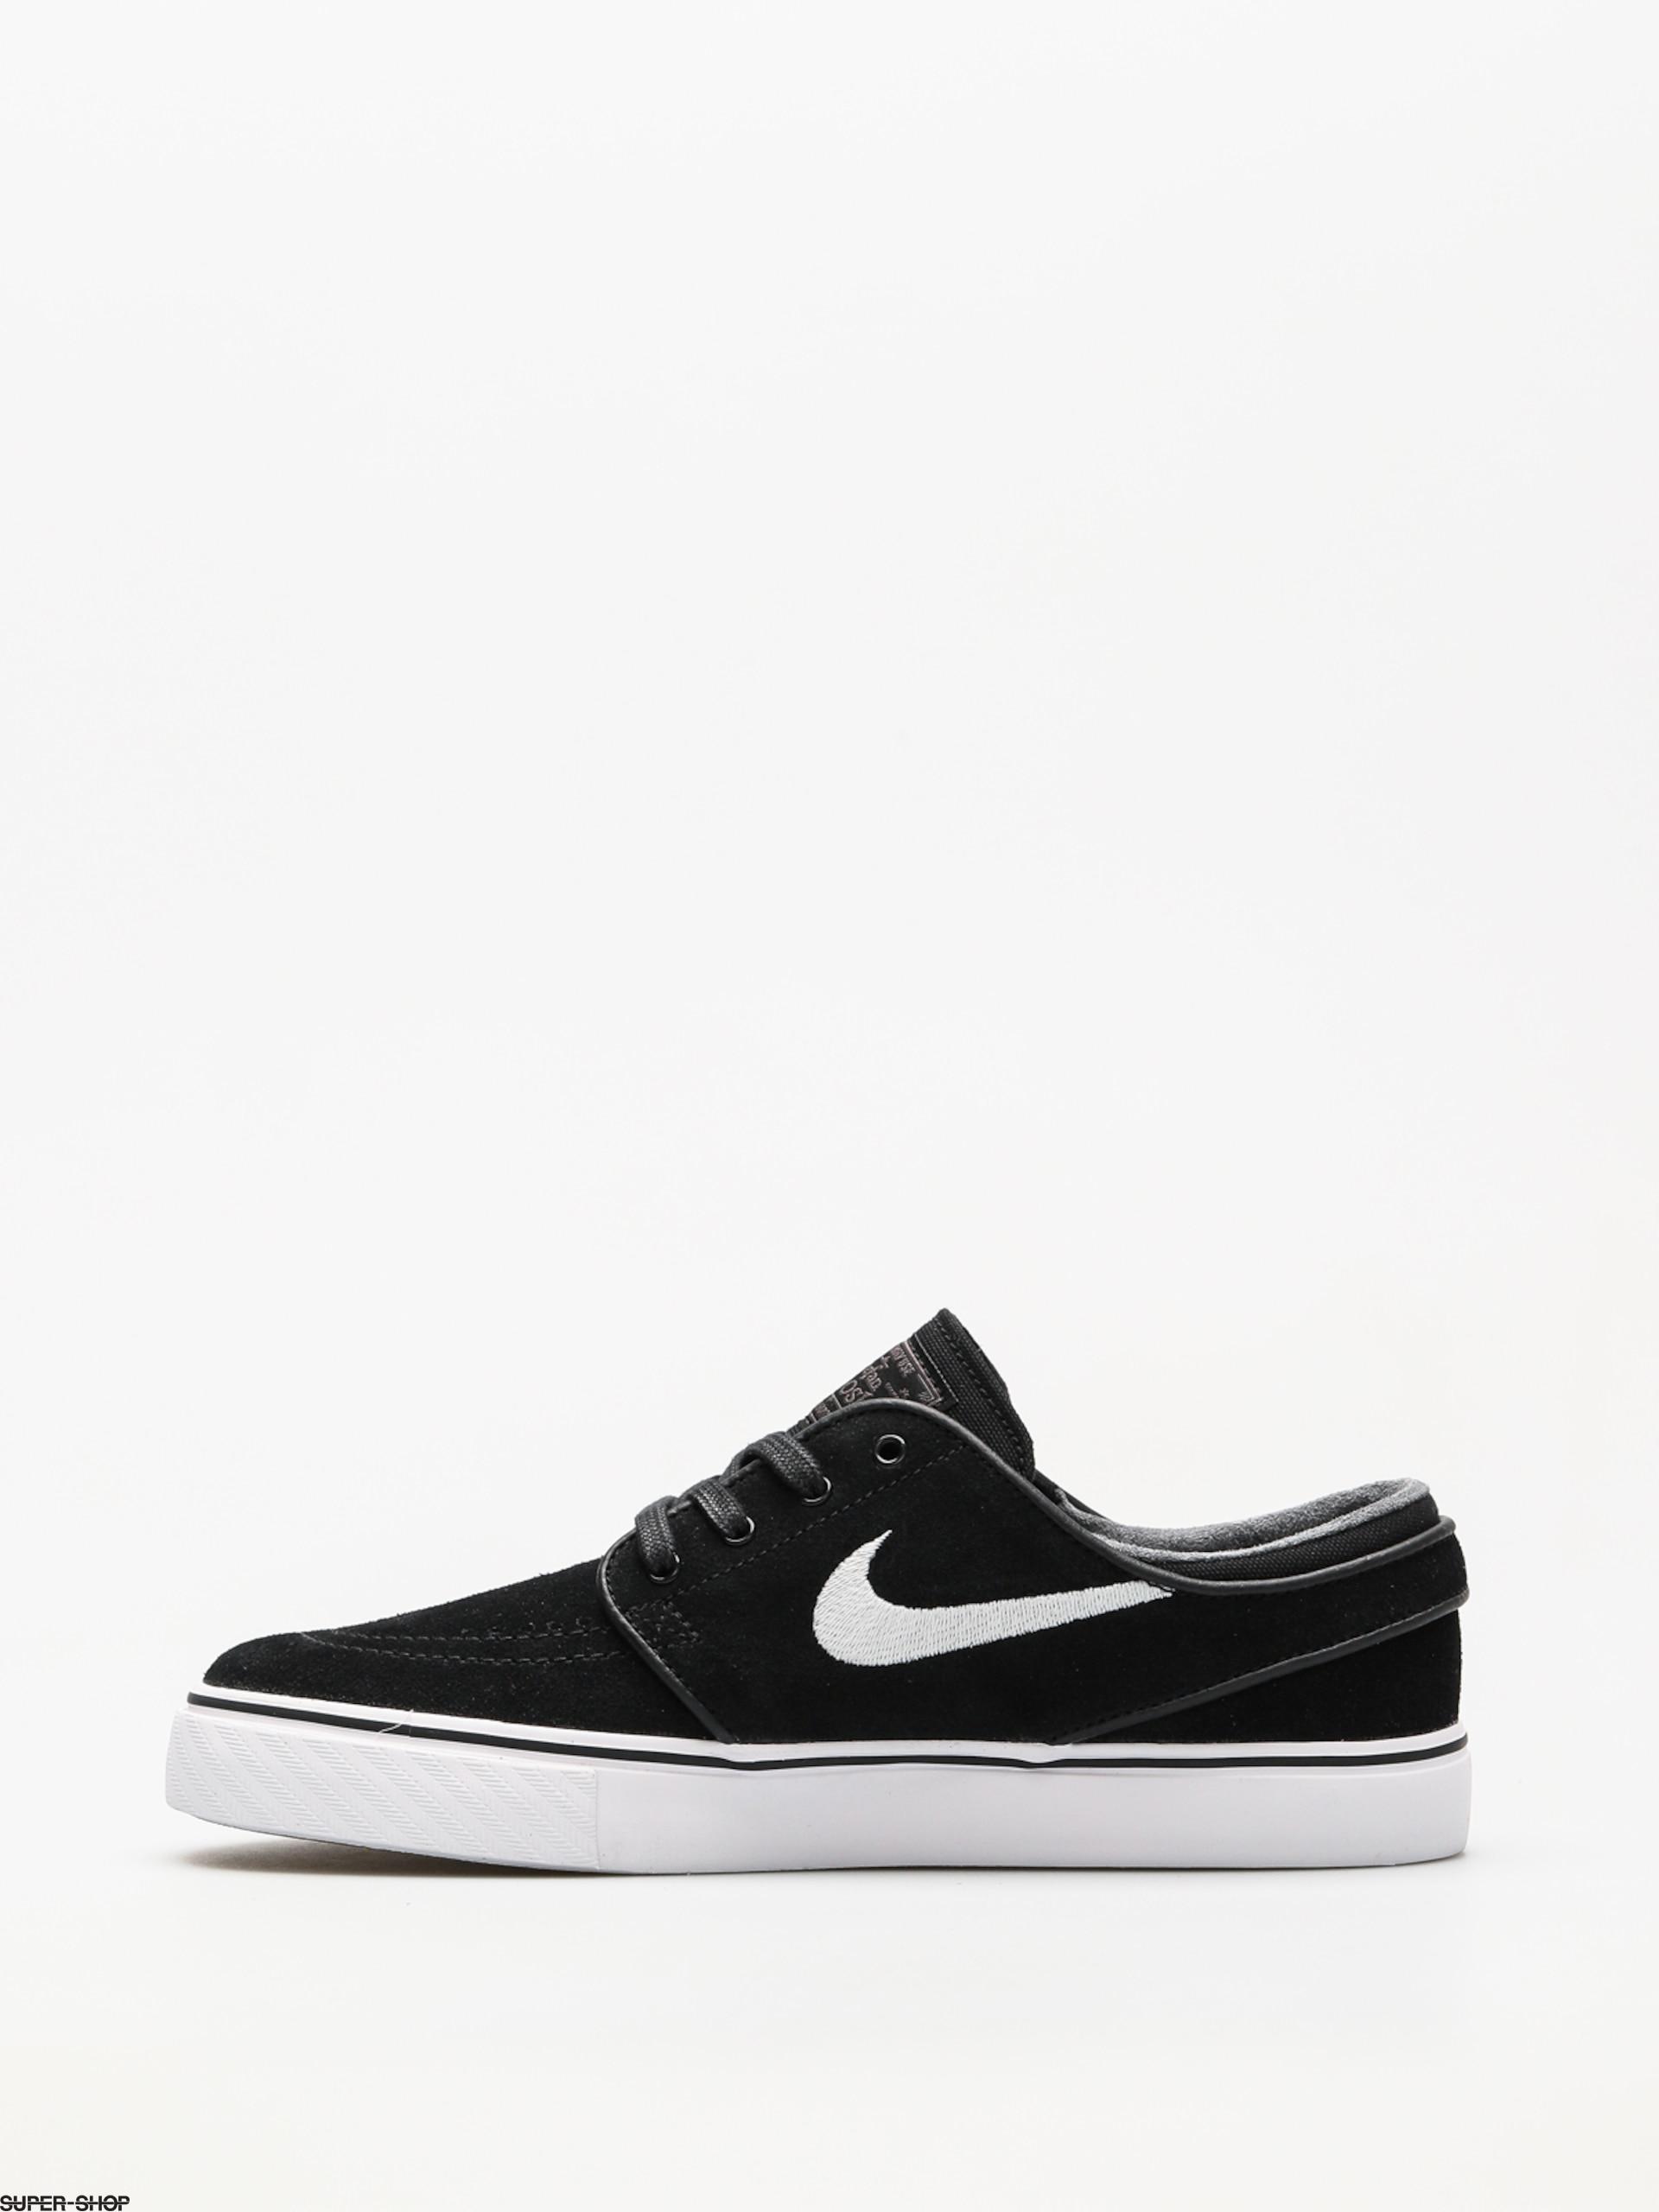 best website 6301b 50a5c Nike SB Shoes Zoom Stefan Janoski (black white thunder grey gum light brown)